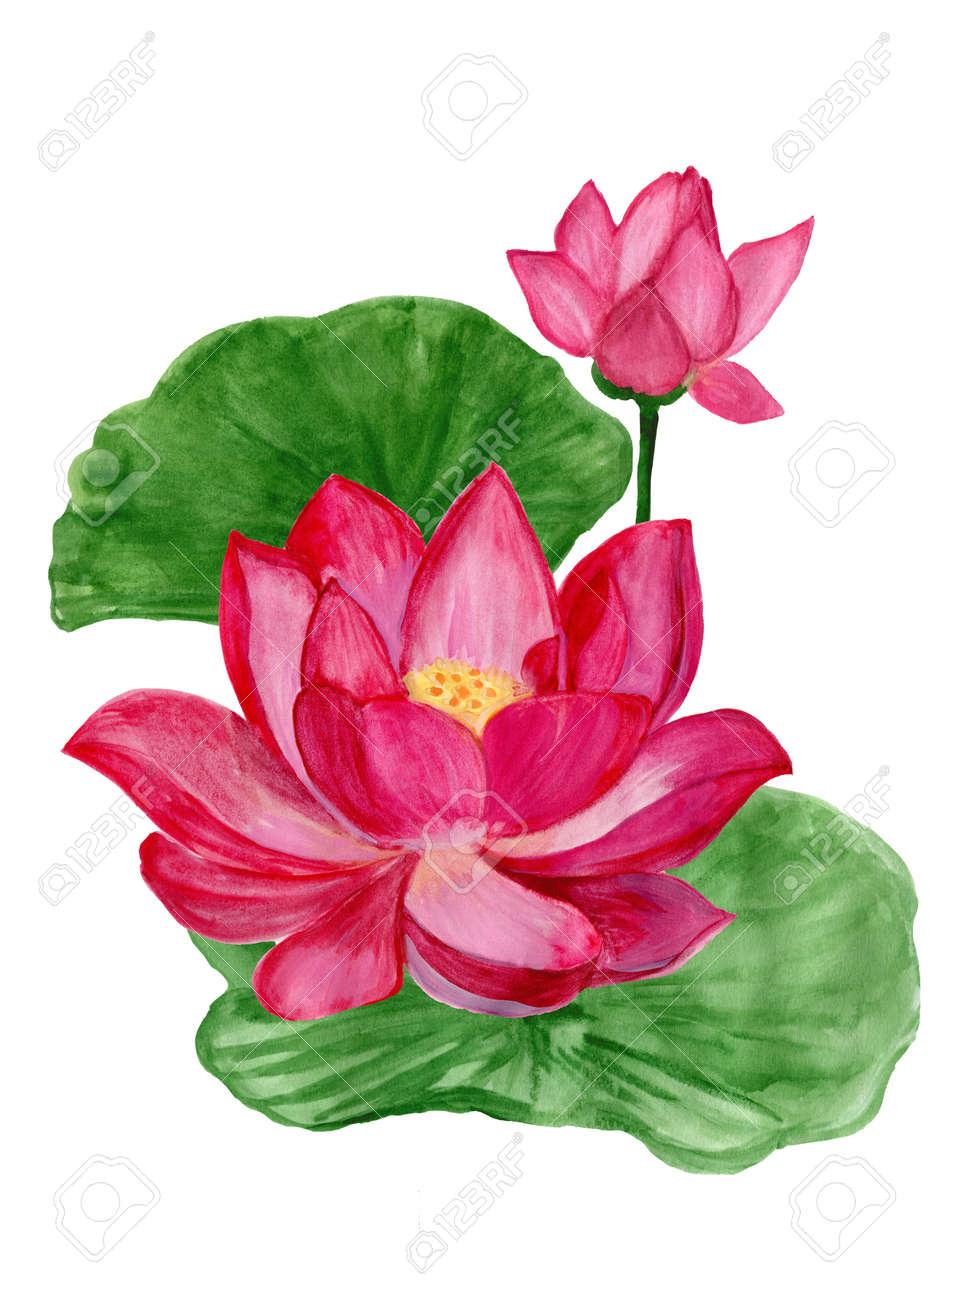 Hand Drawn Watercolor Botanical Illustration Of Lotus Flower Stock